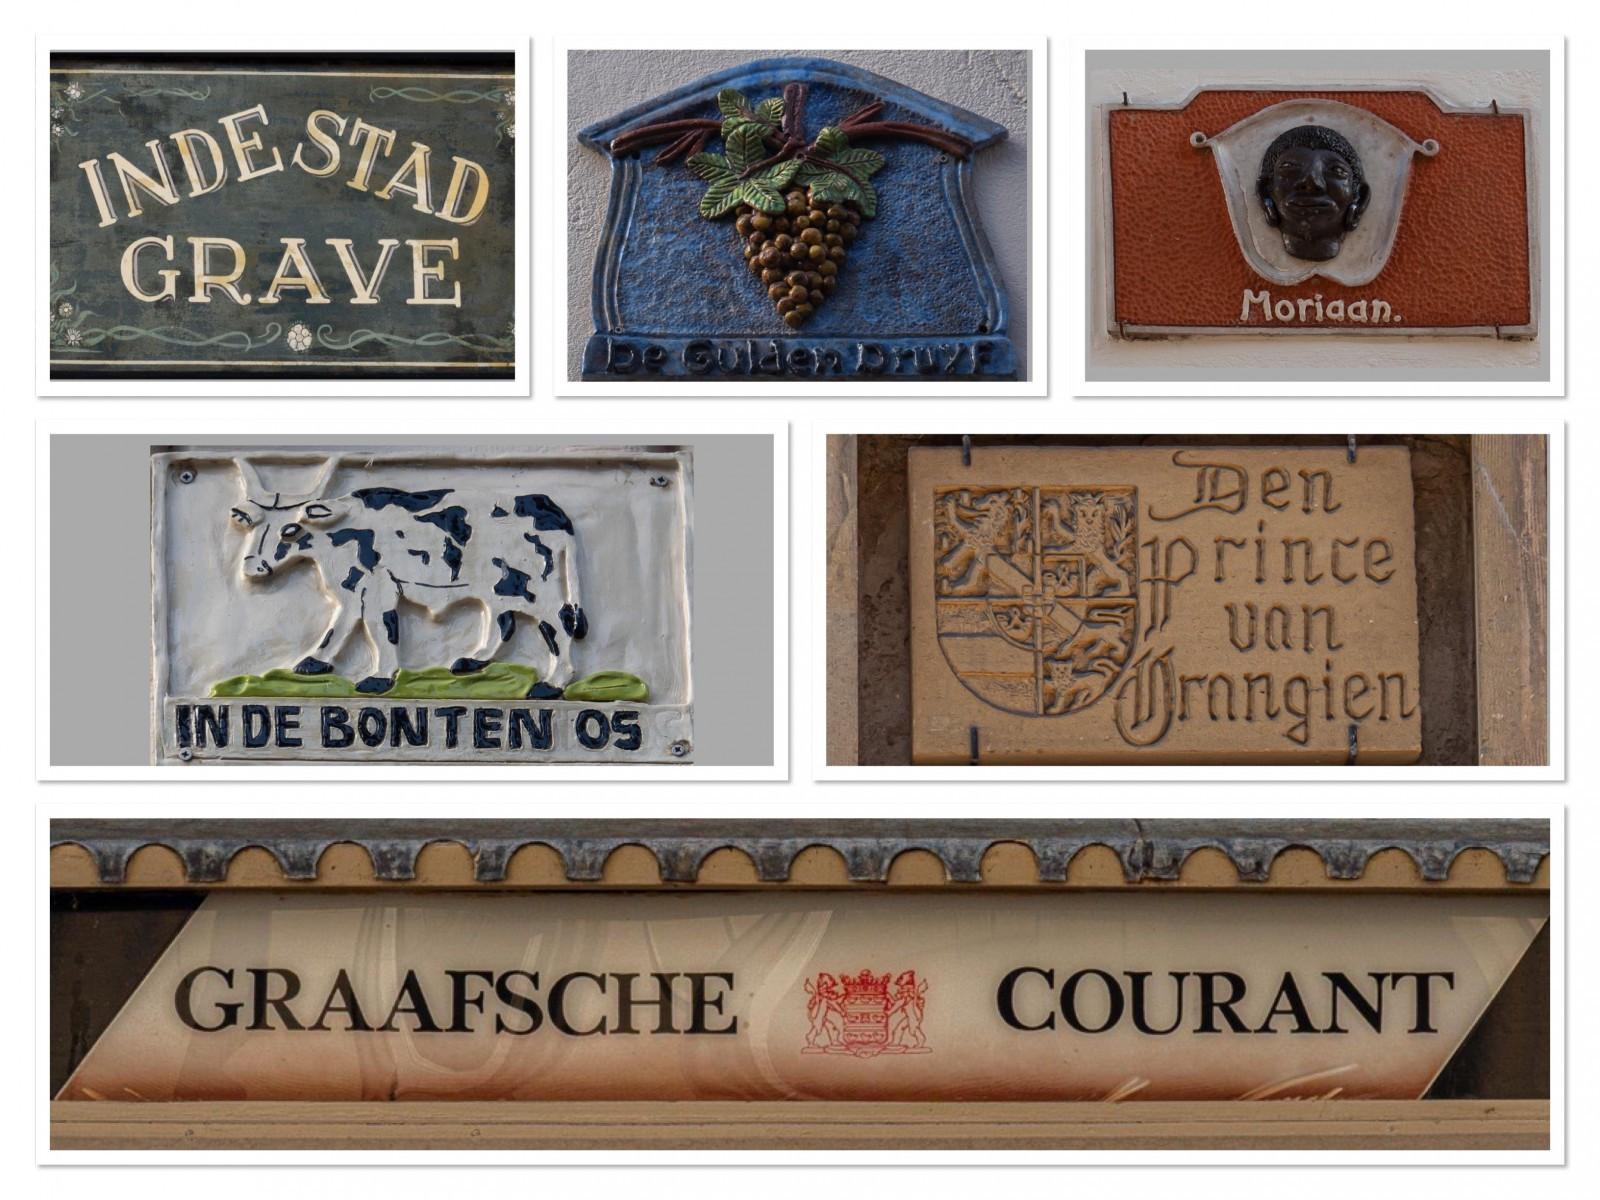 Corrie-v-Bommel-20-April-collage-Grave